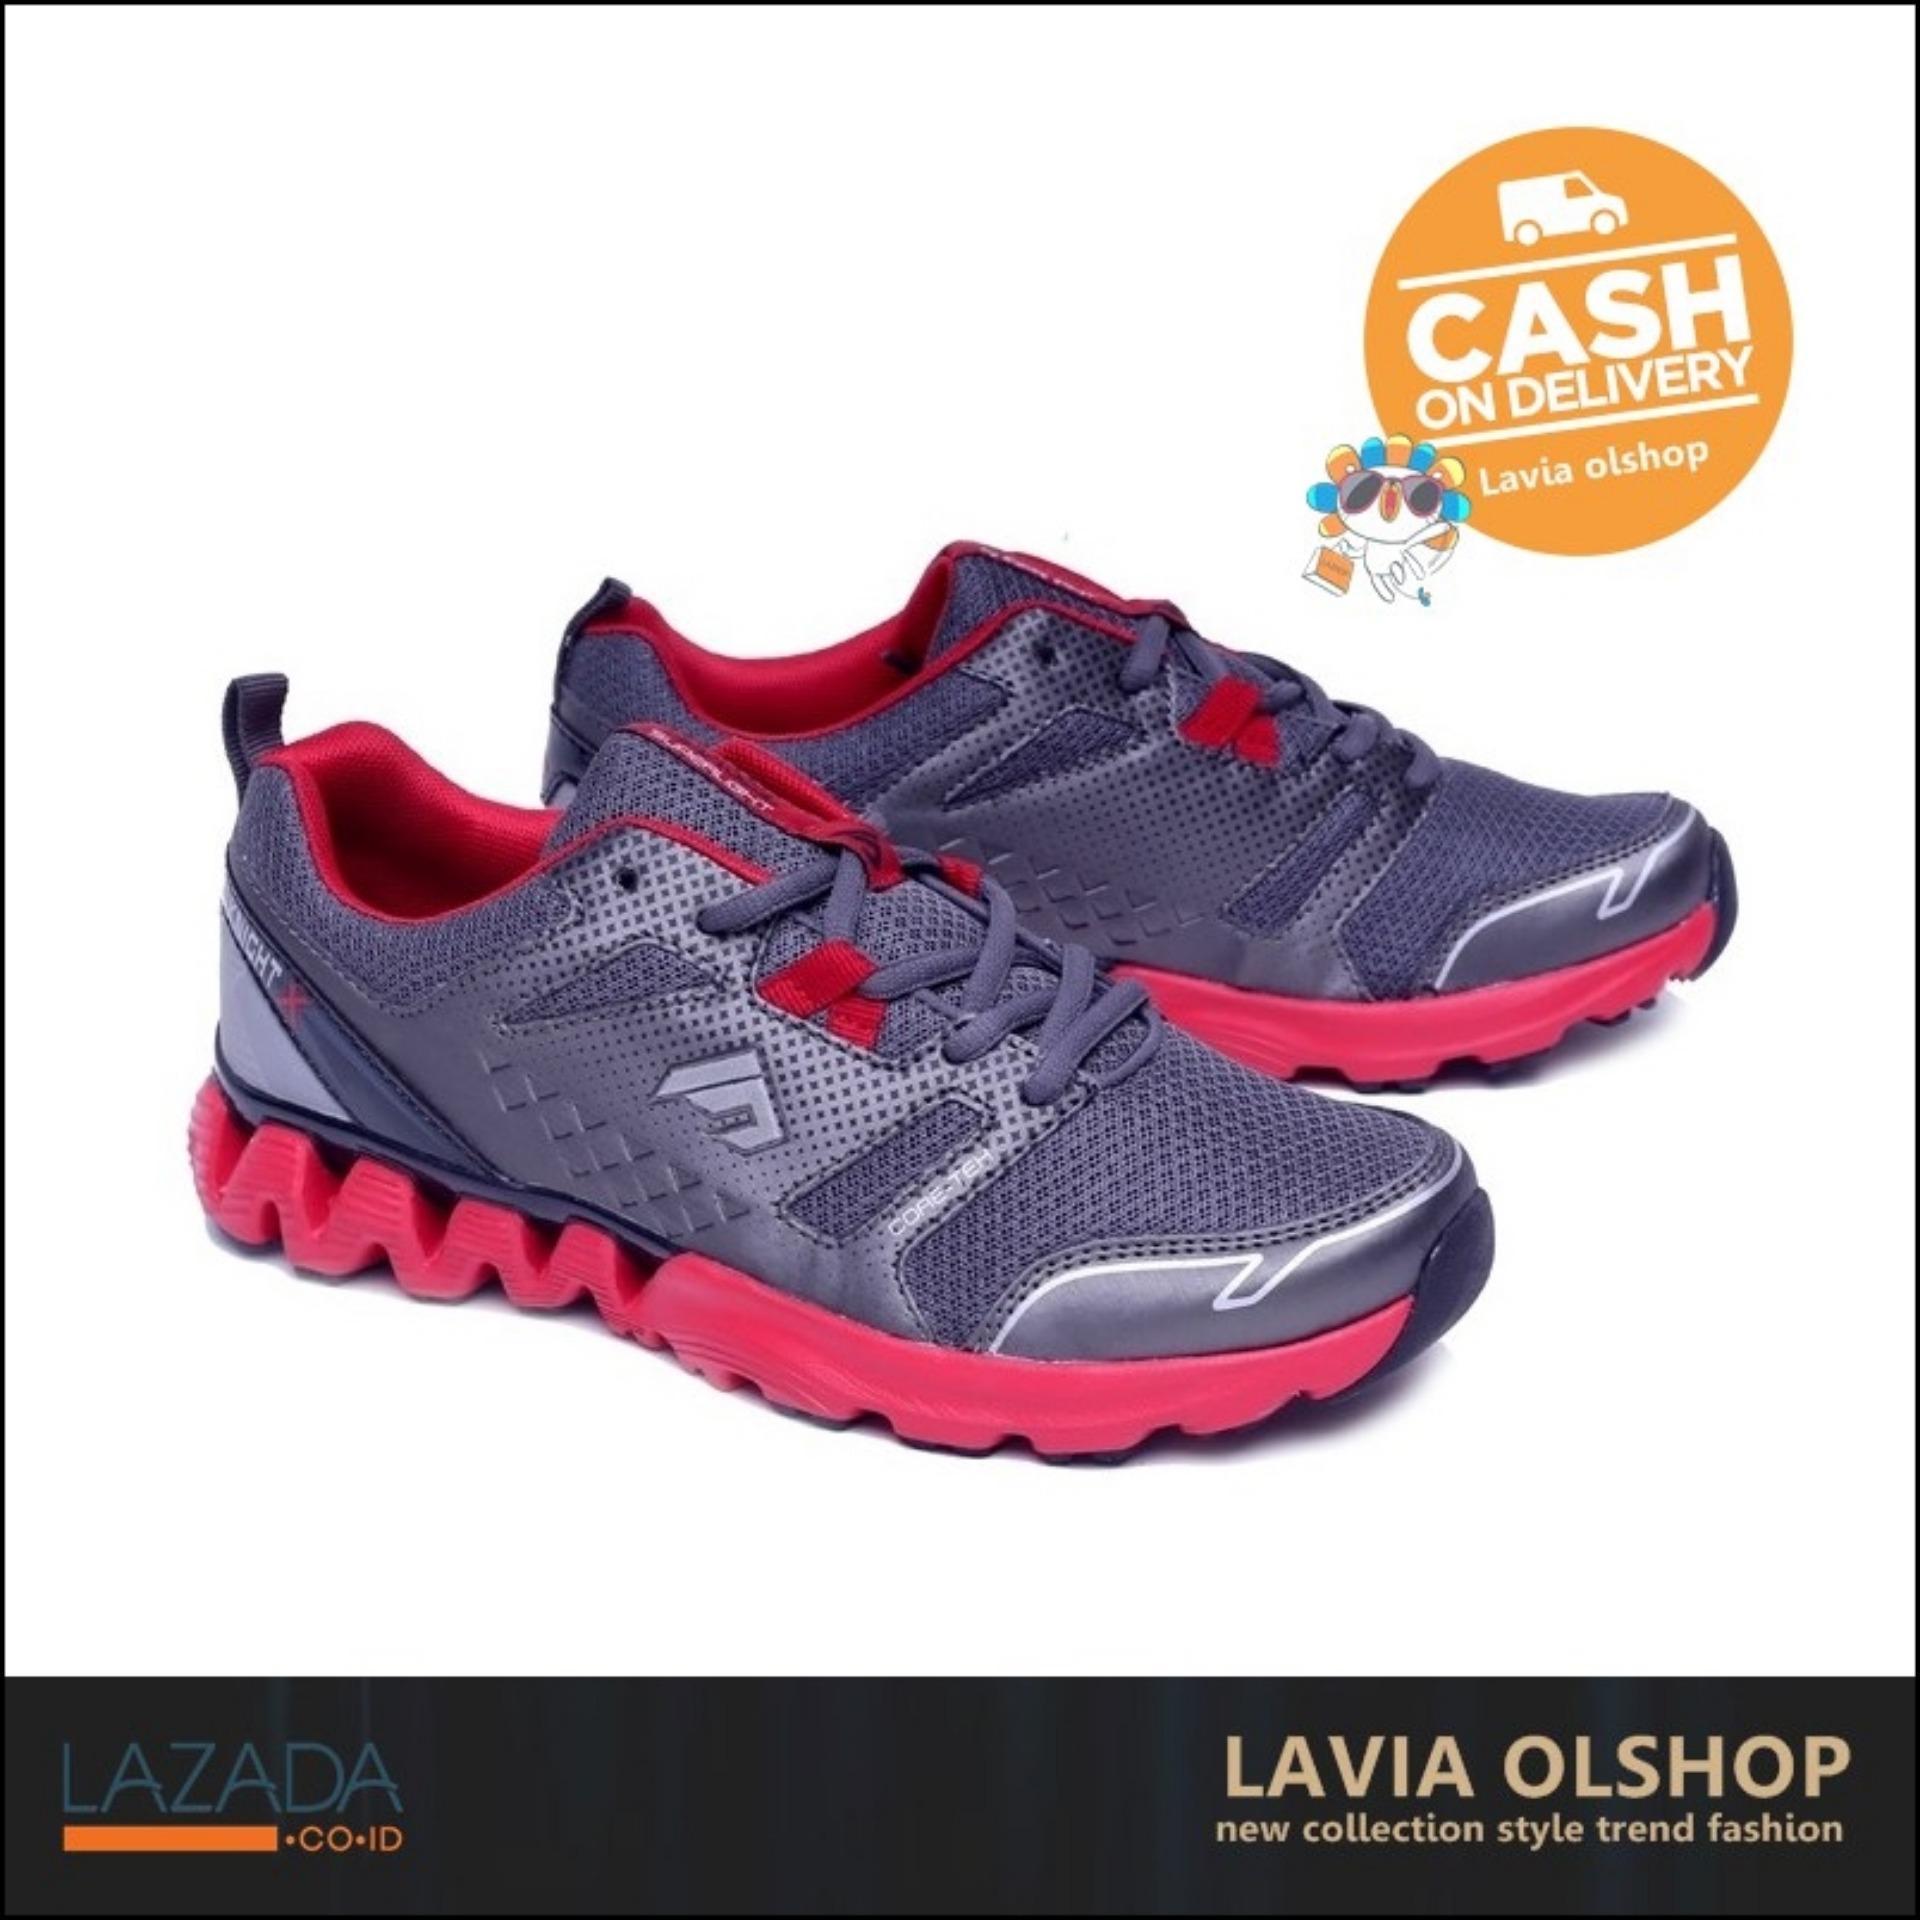 Shoes Sepatu Sport Pria Keren Dan Modis Model Terbaru GRE 7013 - Abu-Abu dab976cba0